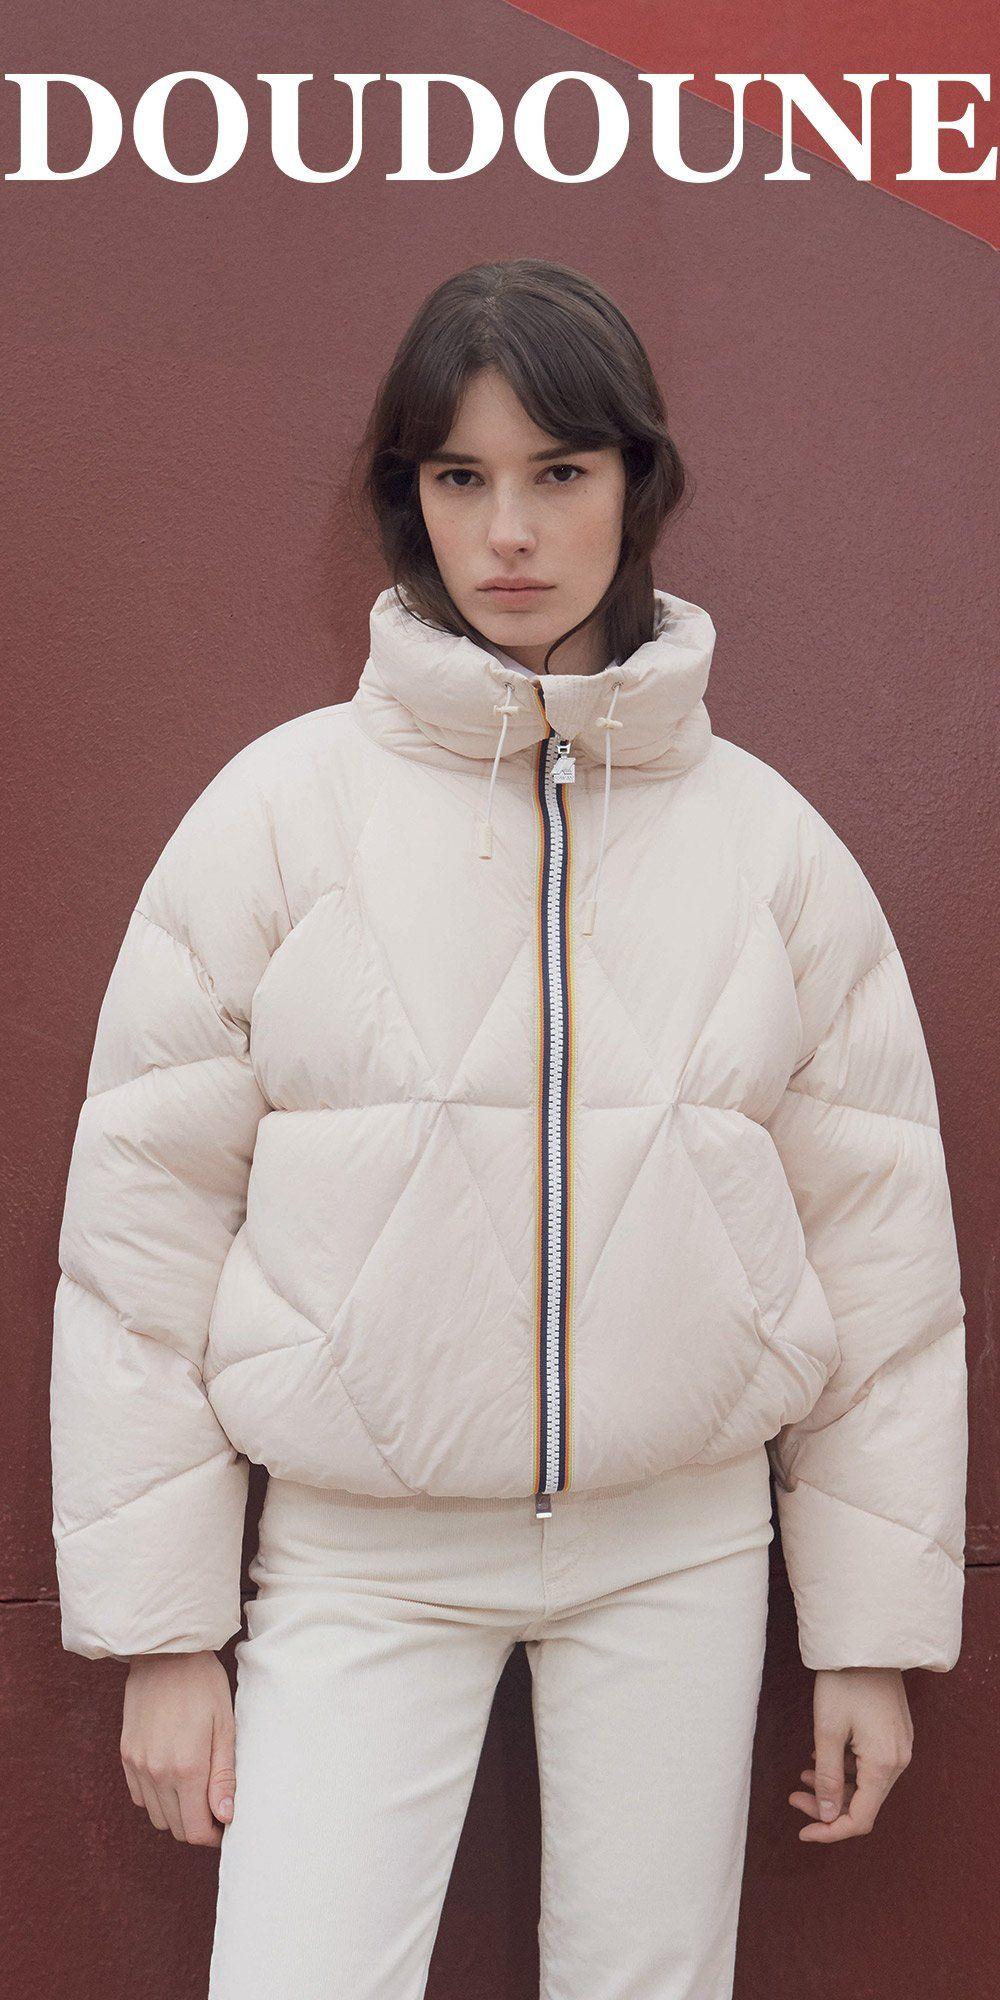 760c369aa24e 7 tendances mode automne-hiver 2018-2019